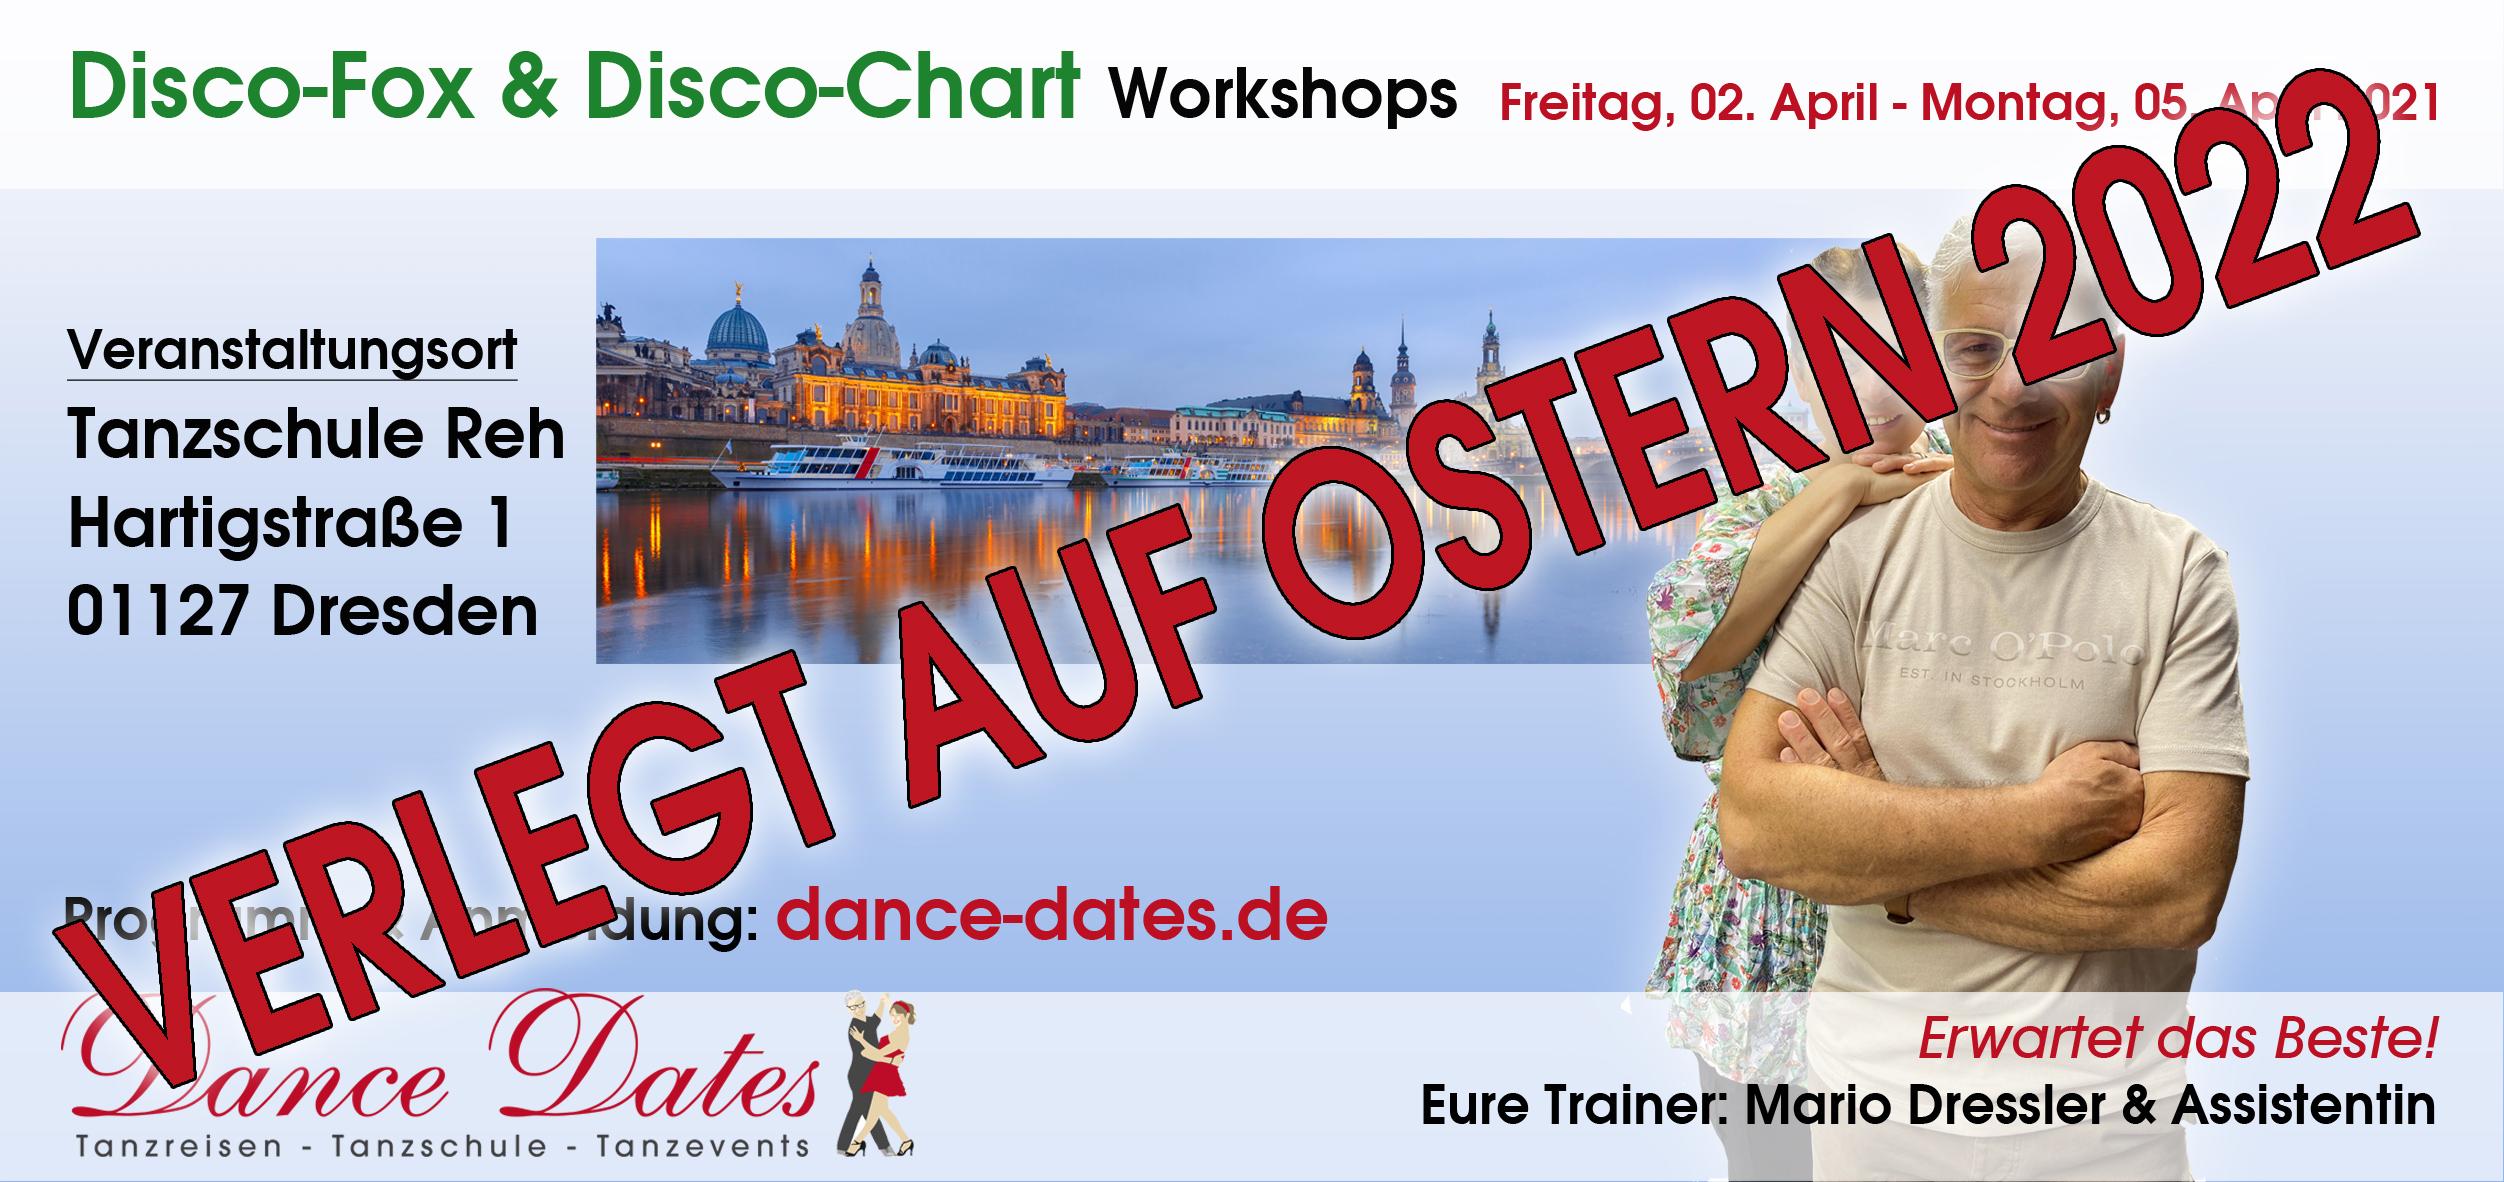 "<span style=""color: blue;"">VERLEGT</span> Dresdener Tanz-Tage - Disco-Fox & Disco-Chart Workshops @ Tanzschule Reh"